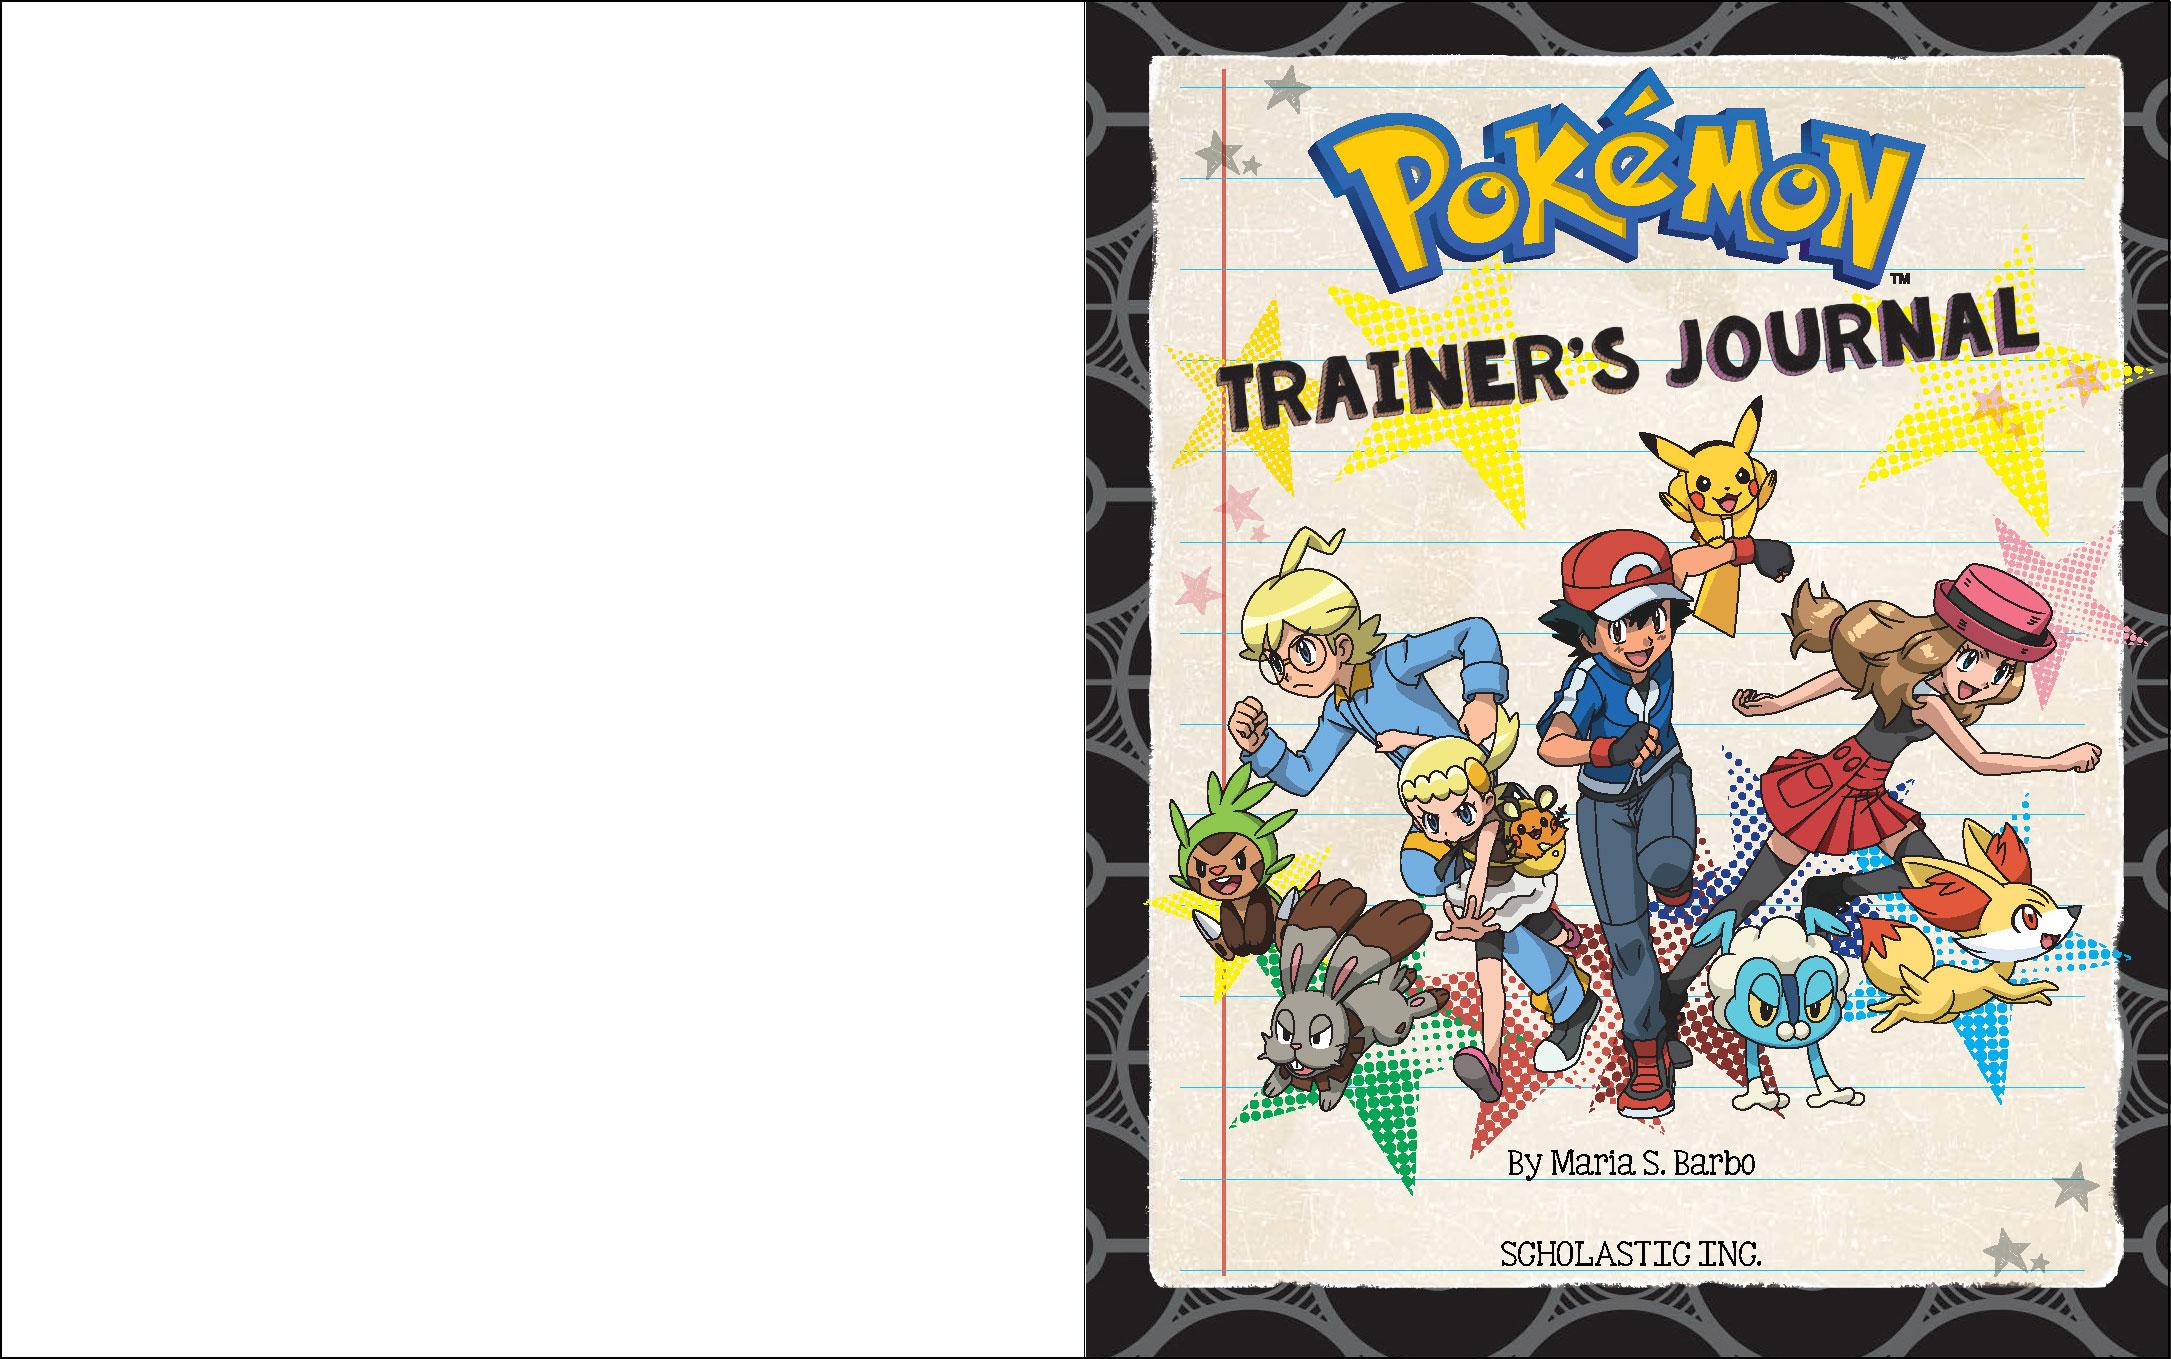 Pokemon_1.jpg